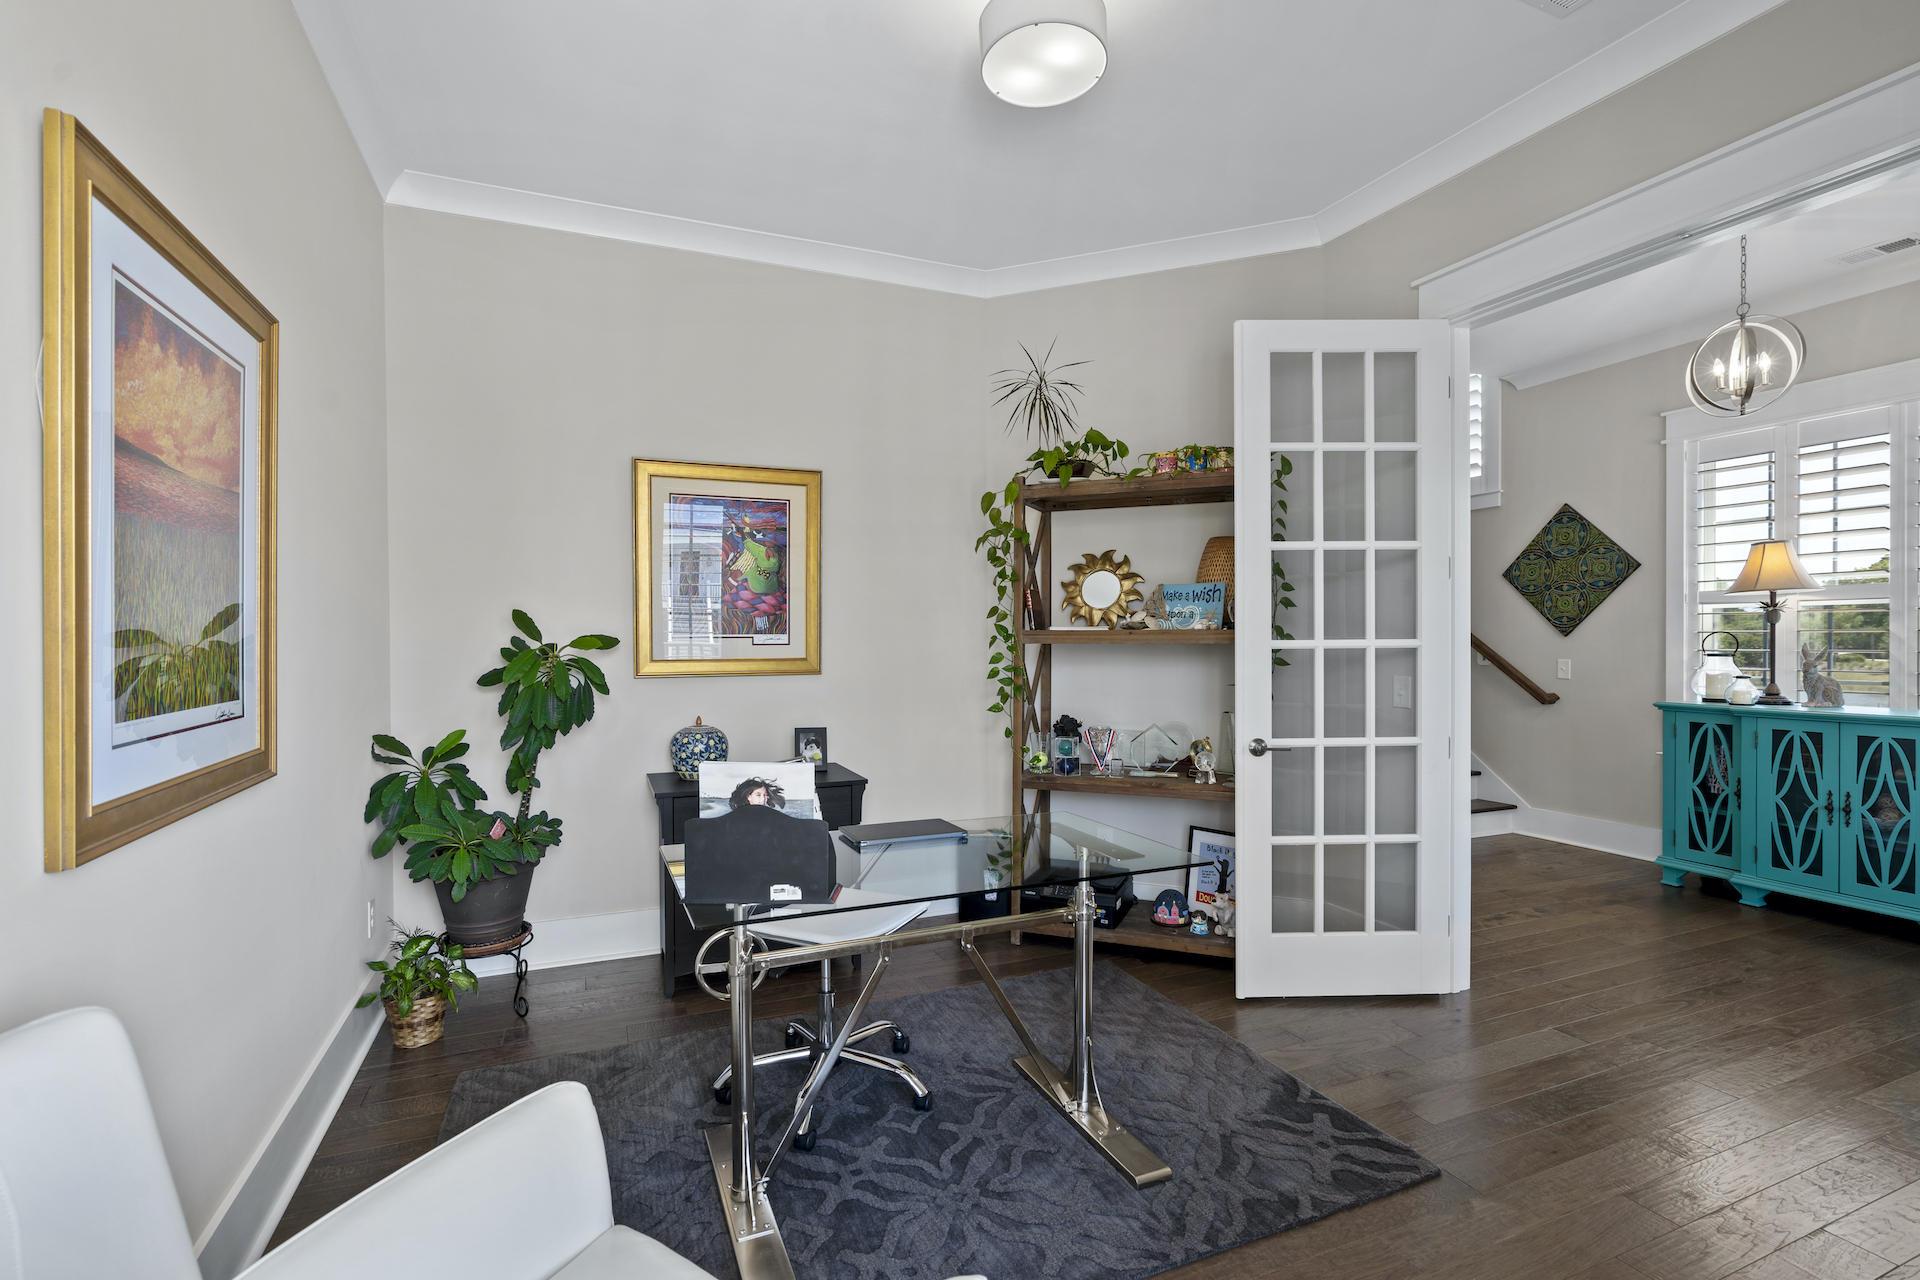 Dunes West Homes For Sale - 2316 Bucktail, Mount Pleasant, SC - 44